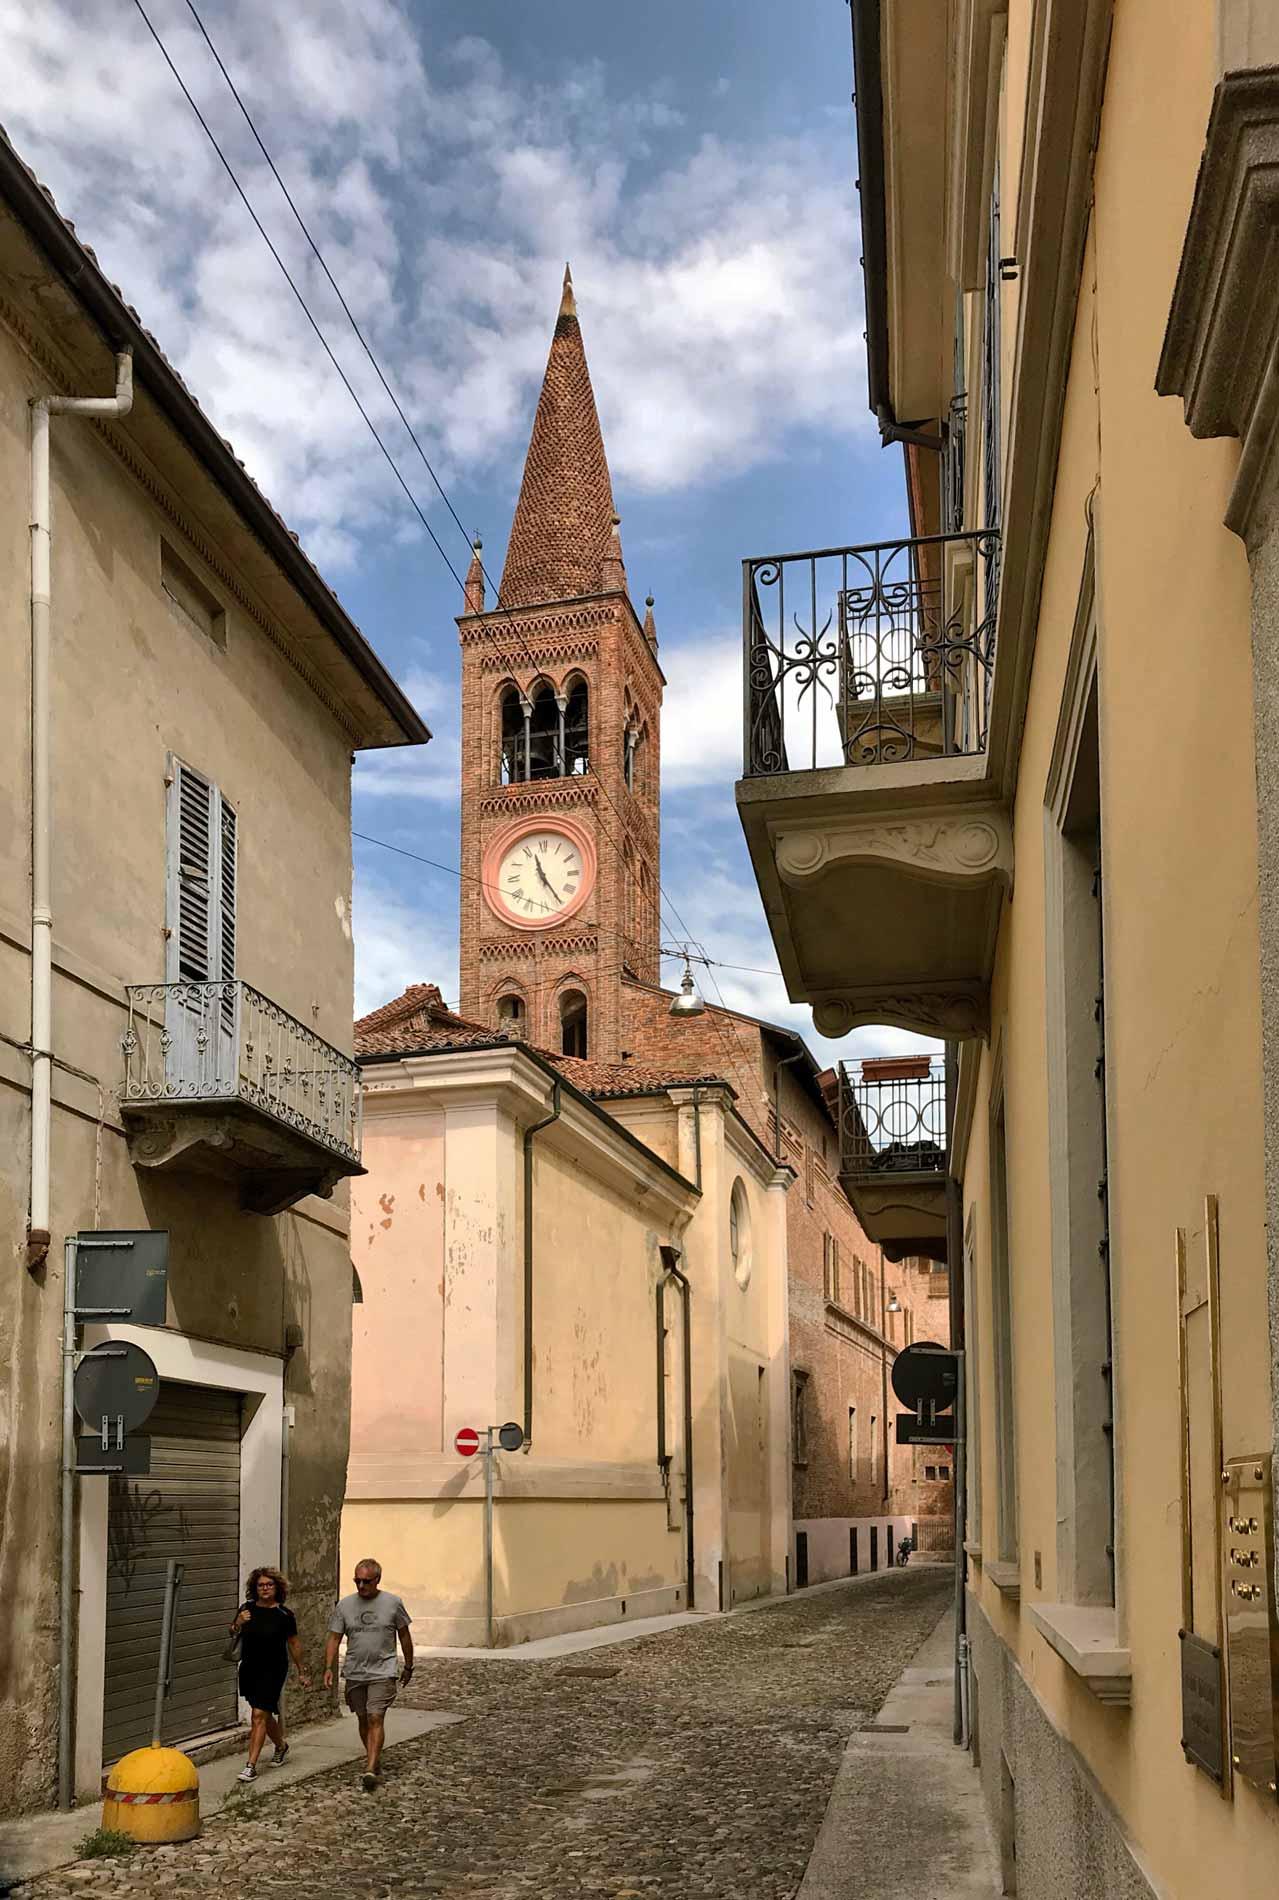 cremona-via-poffacane-campanile-chiesa-santabbondio-case-balcone